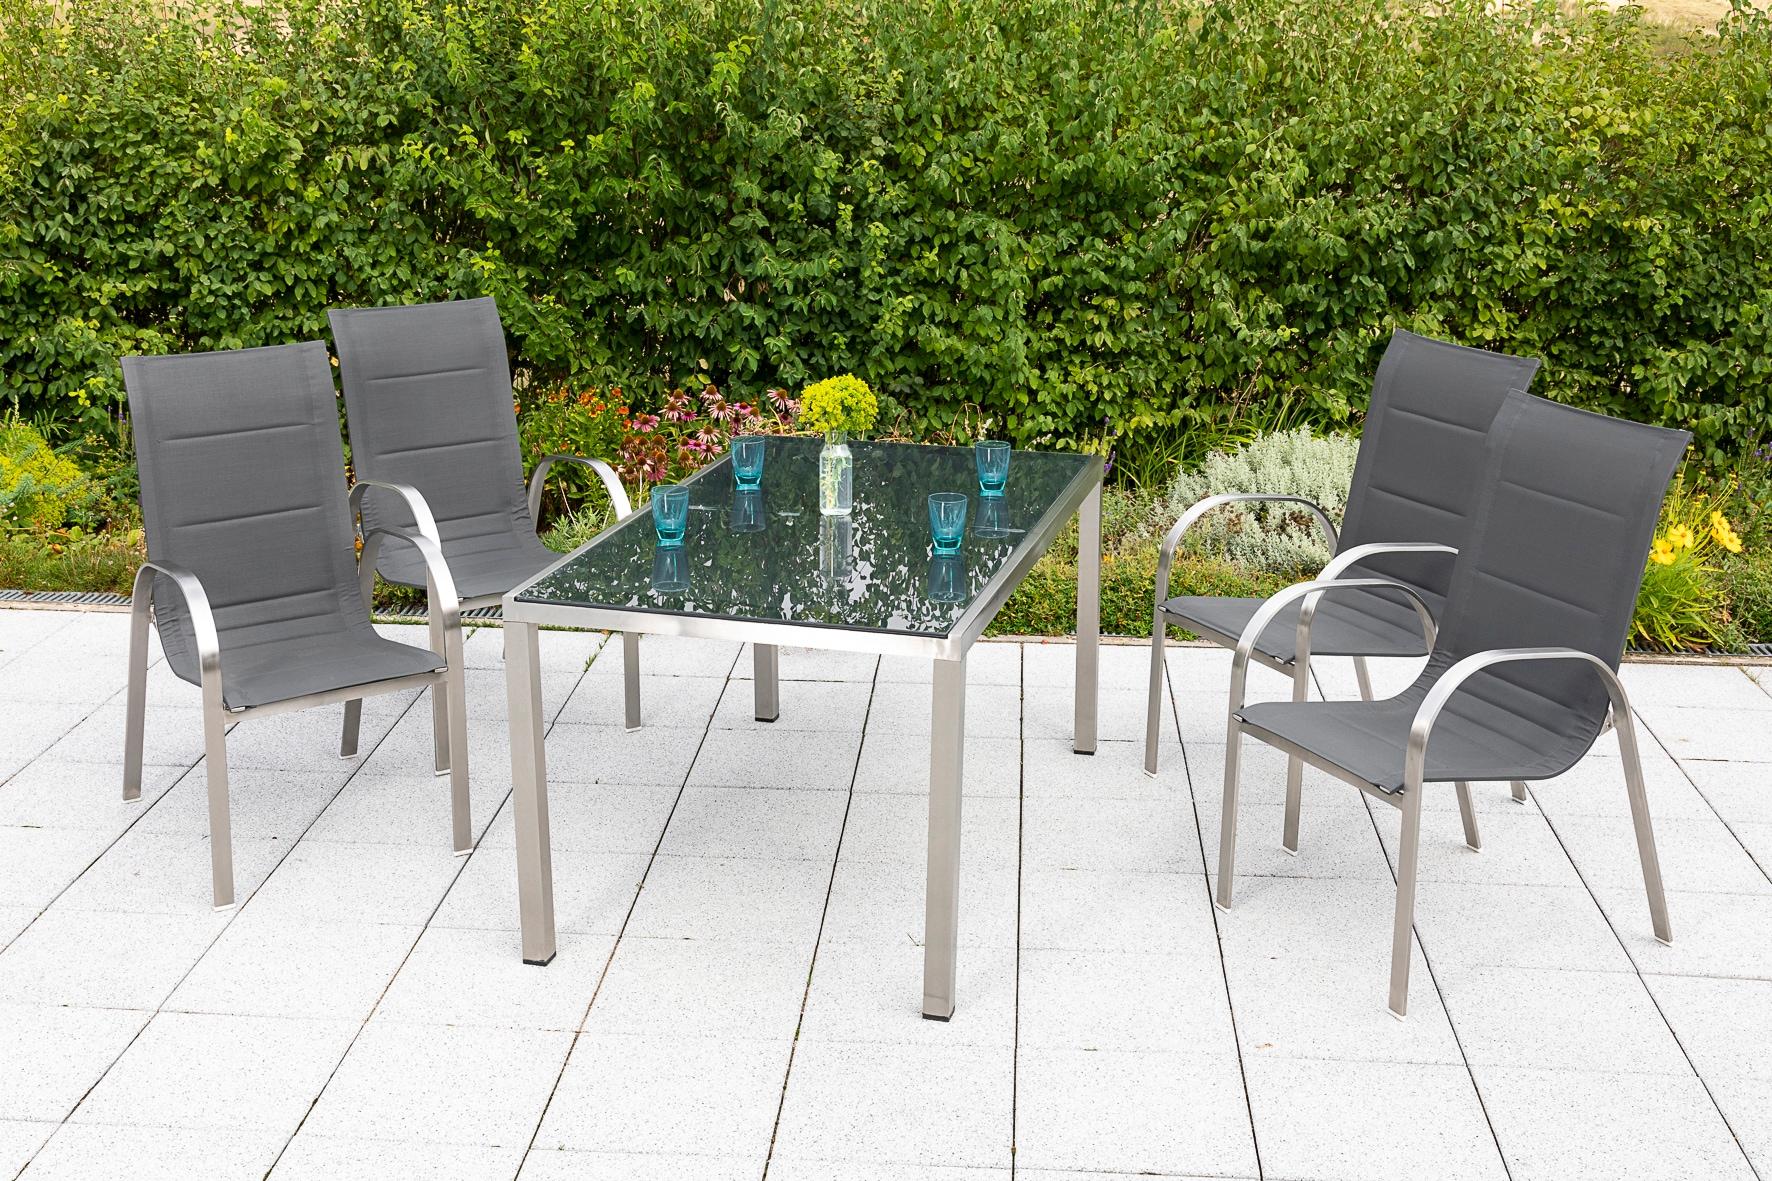 MERXX Gartenmöbelset Lucca 5-tlg 4 Sessel Tisch 150x90 cm Edelstahl/Textil